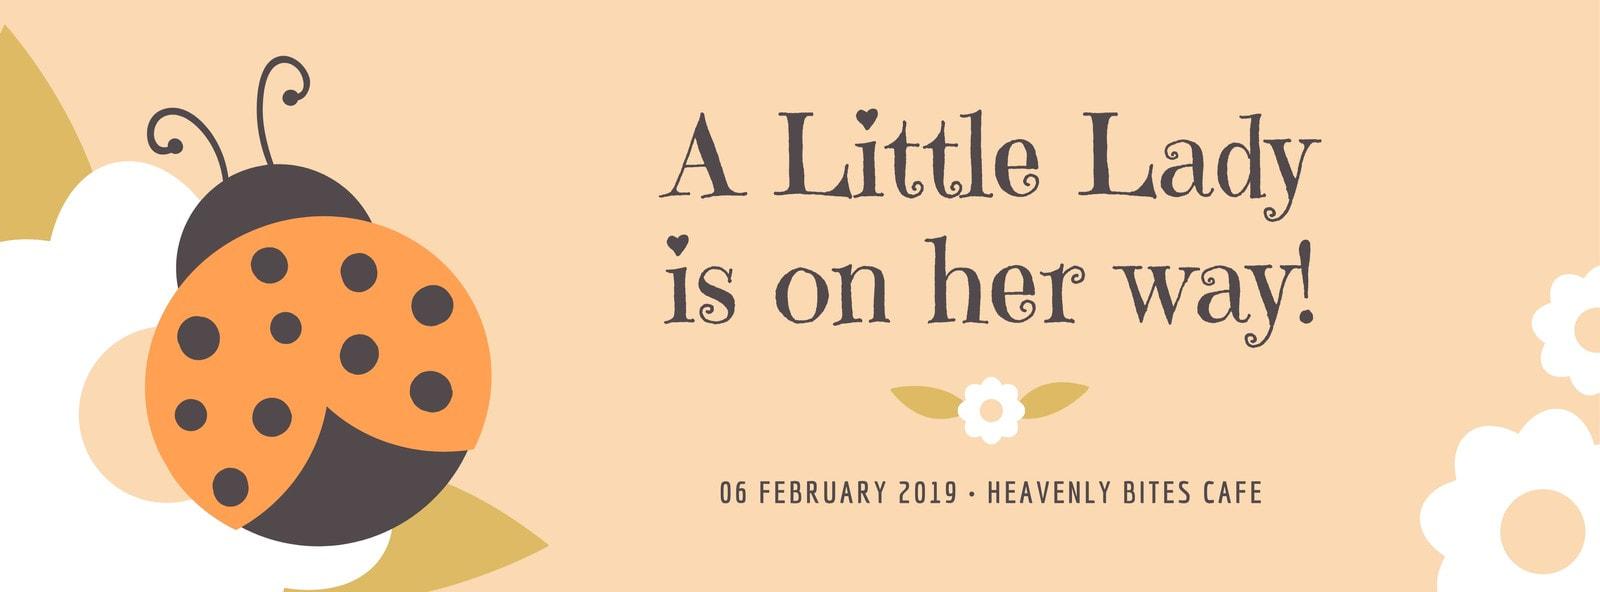 Orange Ladybug Baby Shower Facebook Cover